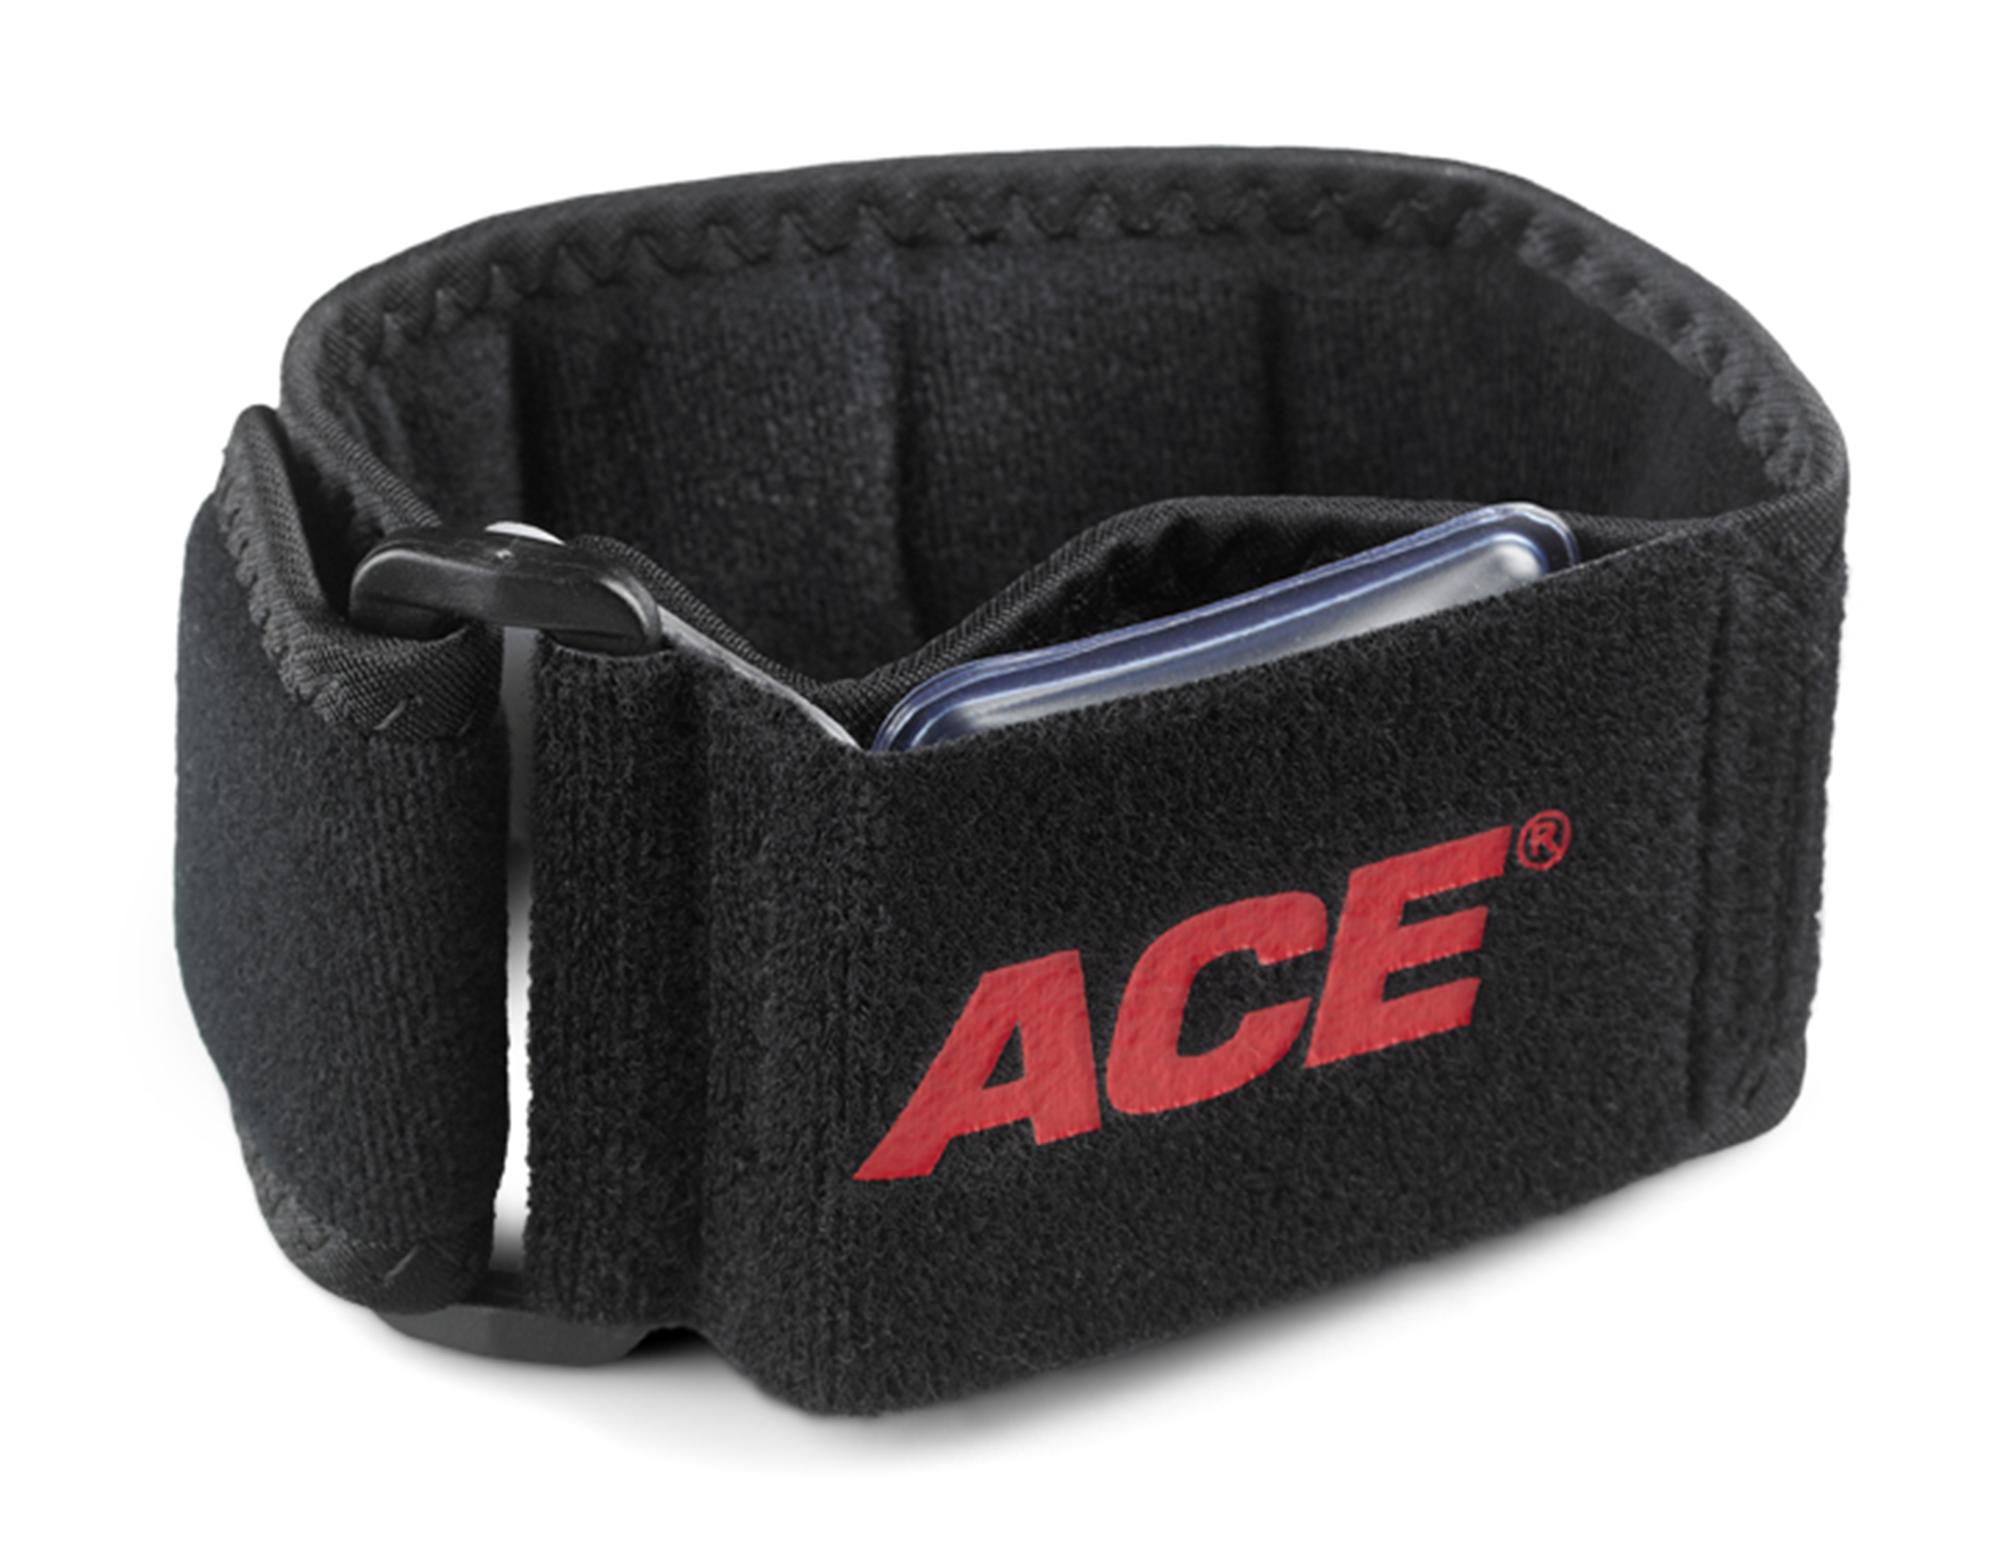 3m Ace Tm Elbow Strap Adjustable Fitness Amp Sports